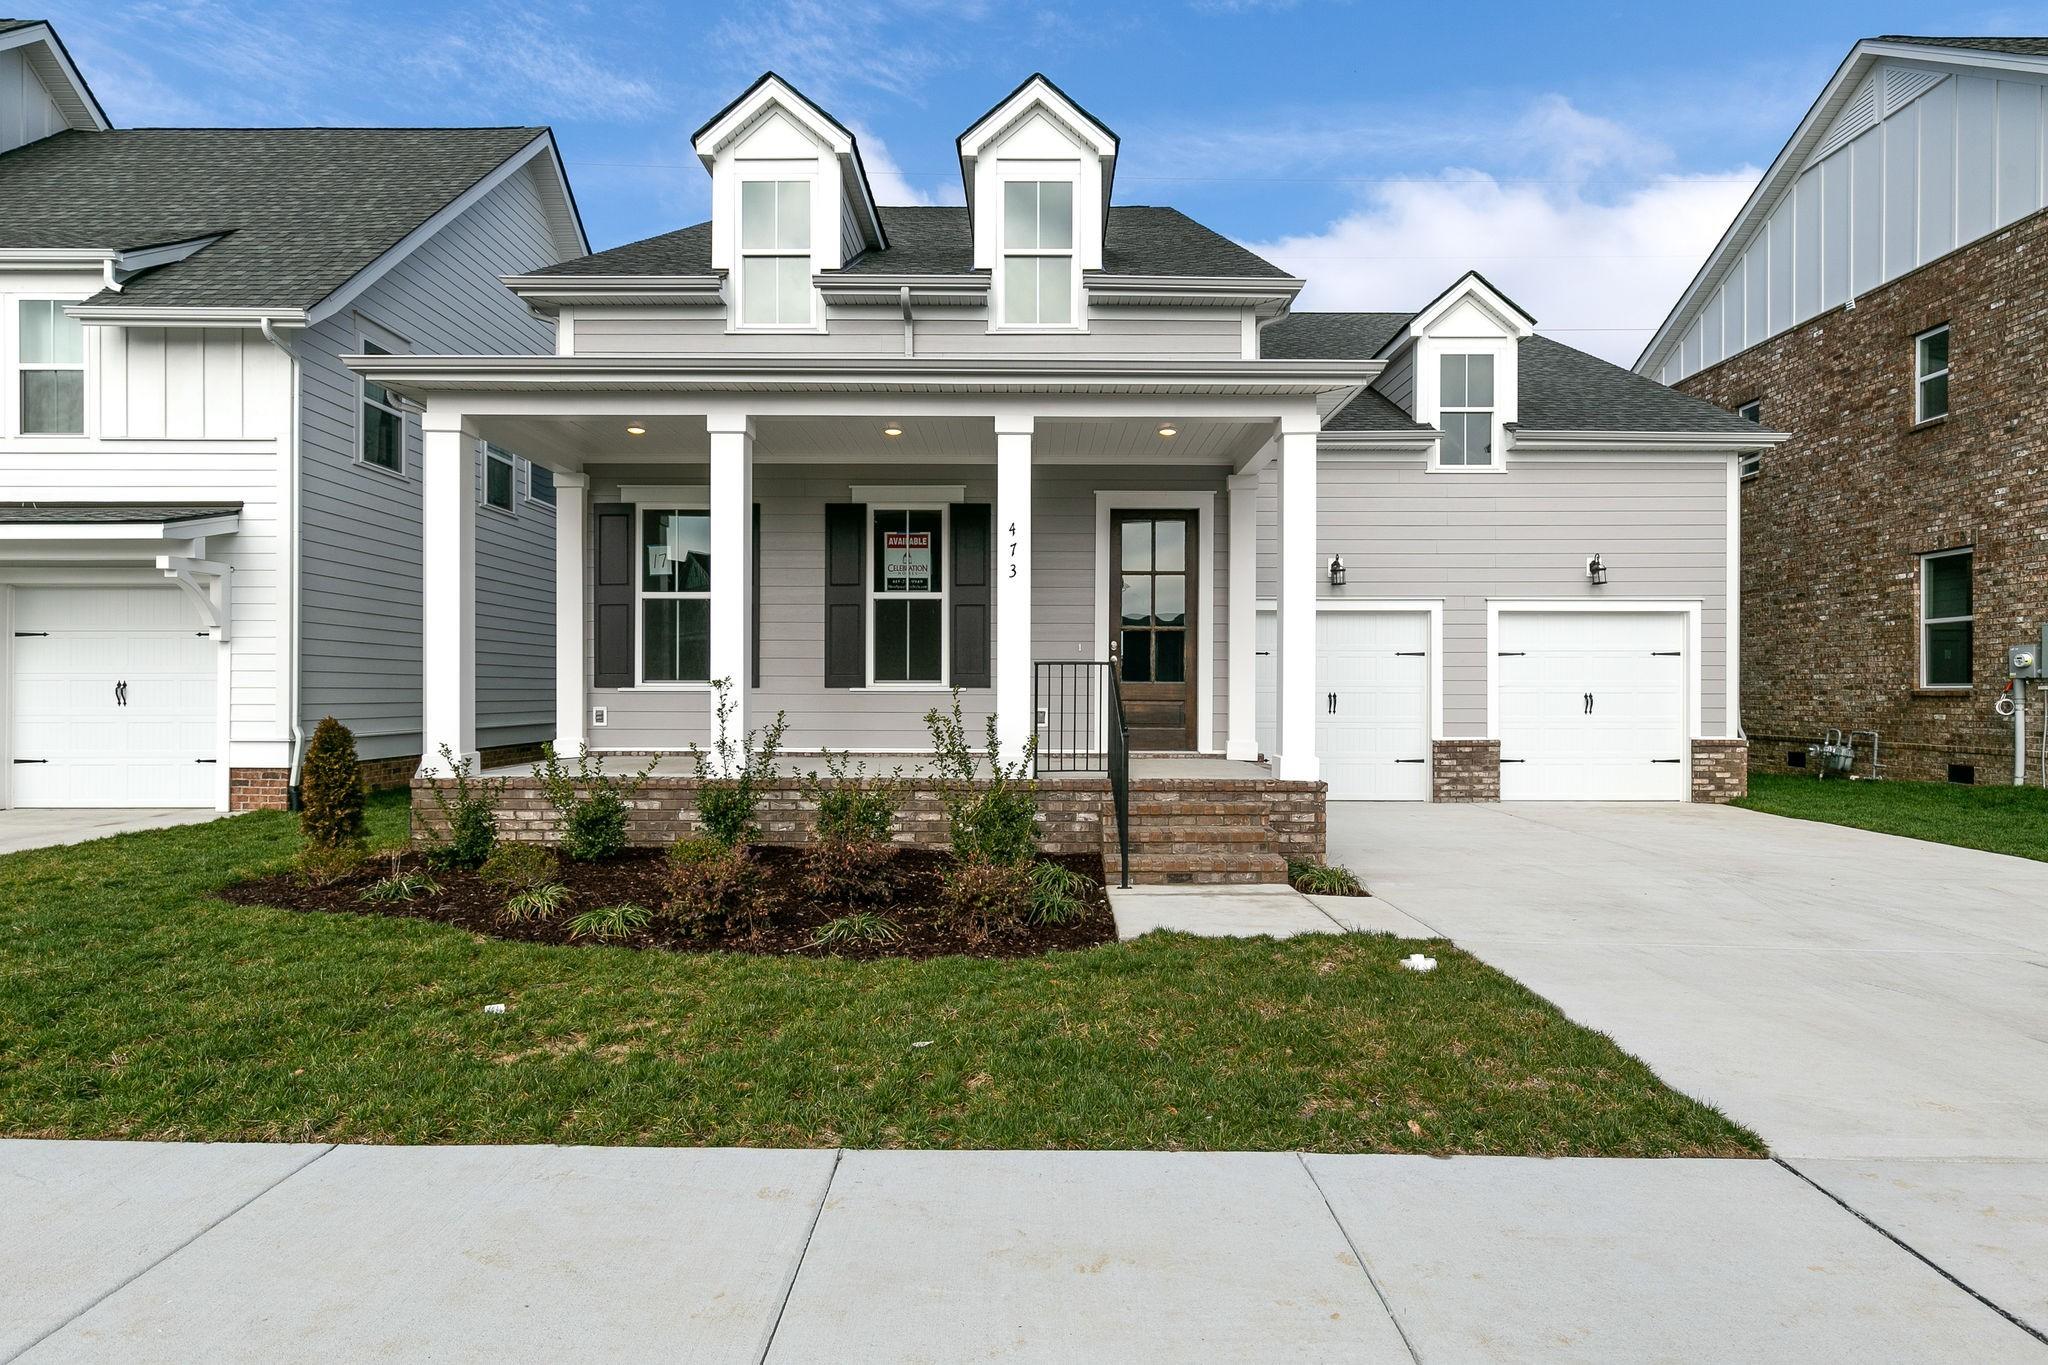 473 River Bluff Dr, Franklin, TN 37064 - Franklin, TN real estate listing